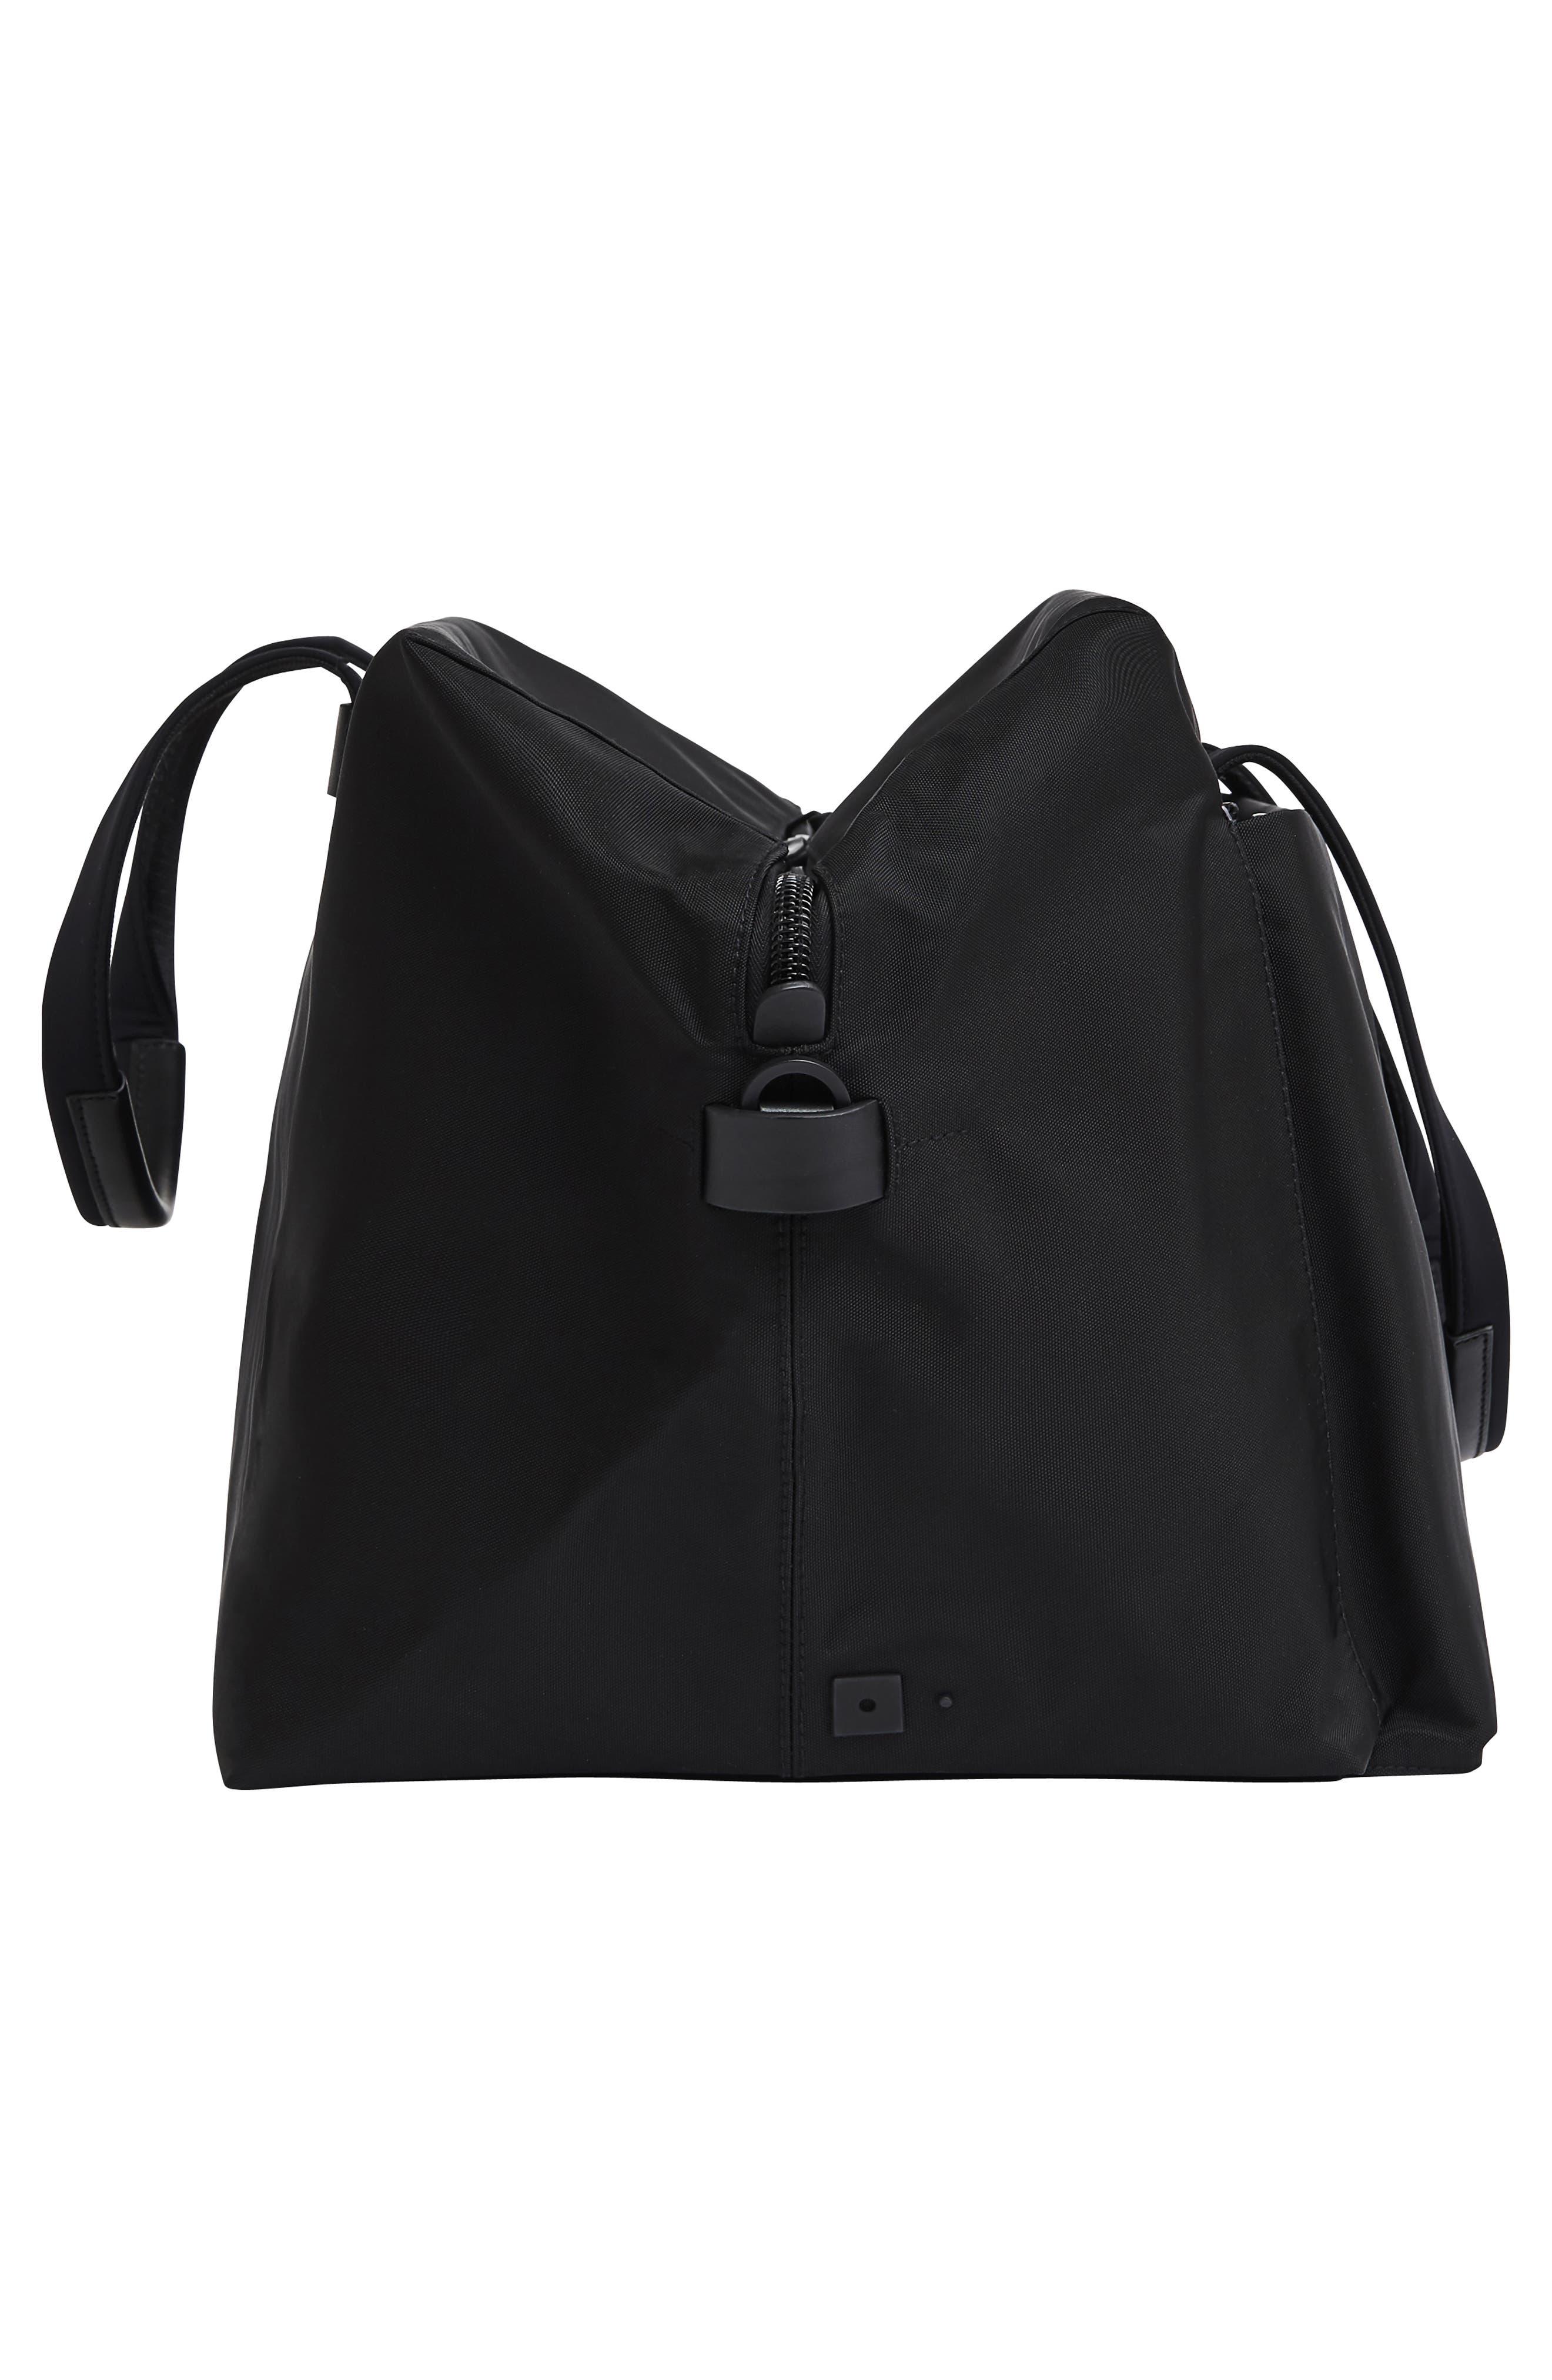 Lightweight Duffel Bag,                             Alternate thumbnail 3, color,                             Black Nylon/ Black Leather